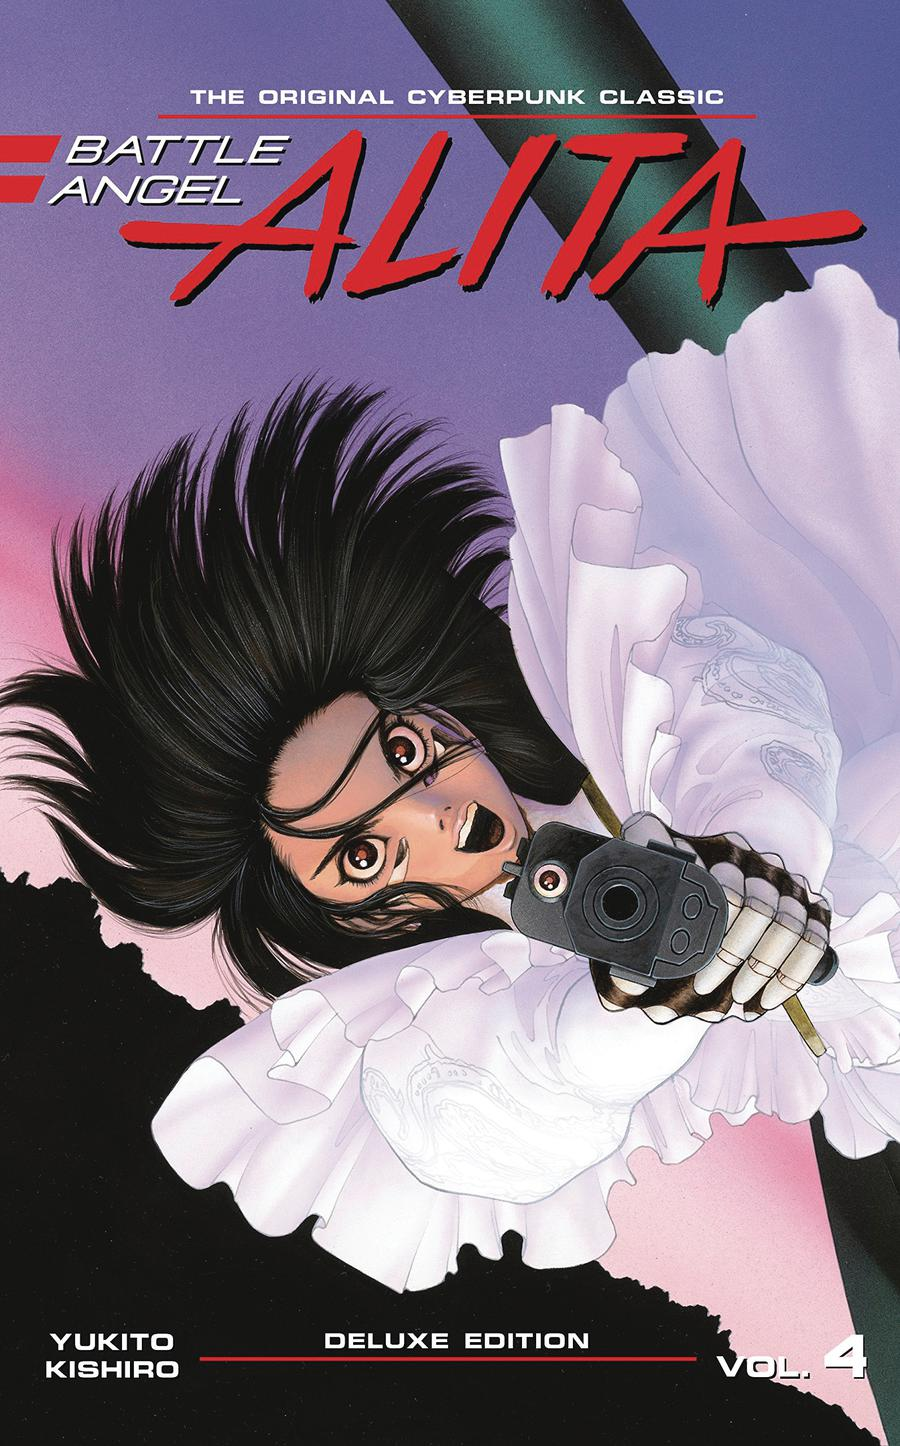 Battle Angel Alita Deluxe Edition Vol 4 HC